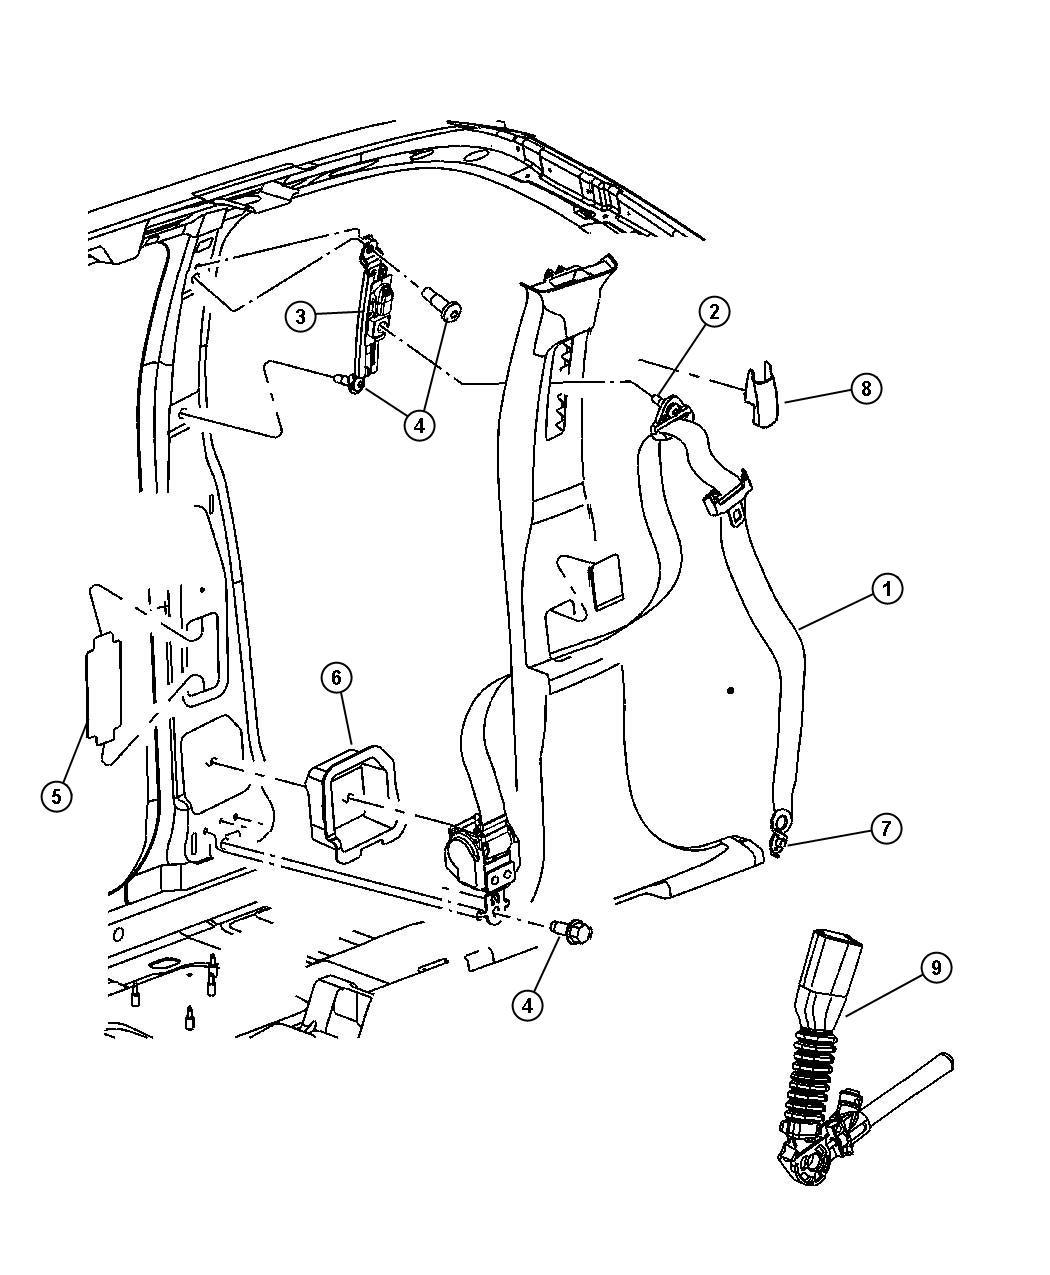 tags: #2005 chevy silverado wiring diagram#08 chevy silverado trailer wiring  diagram#2002 chevy silverado wiring diagram#2008 chevy silverado wiring